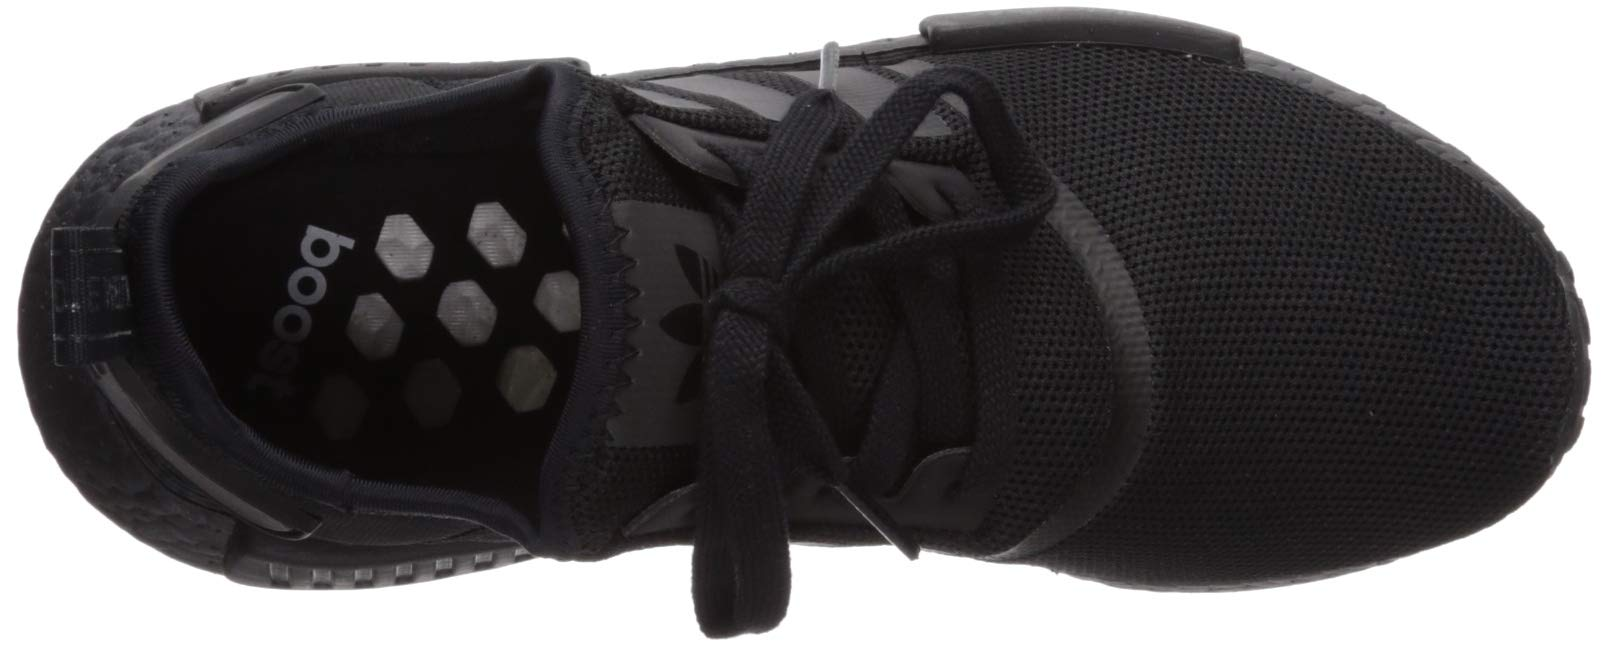 614Kec0LHHL - adidas Men's NMD_r1 Trainers Black Size: 4.5 UK